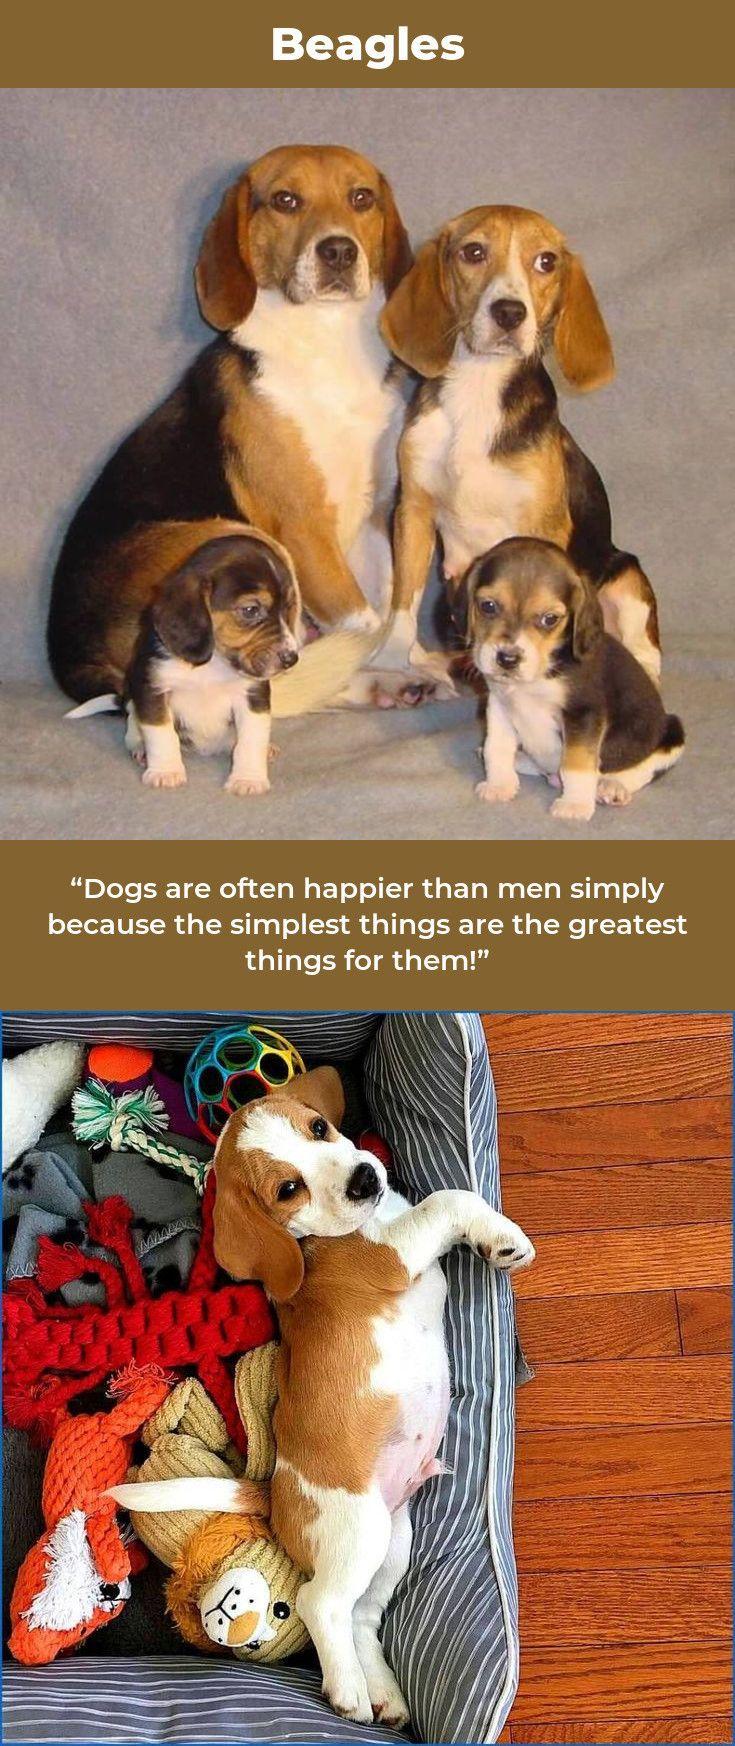 Beagle Friendly And Curious Beagle Puppy Beagle I Love Dogs